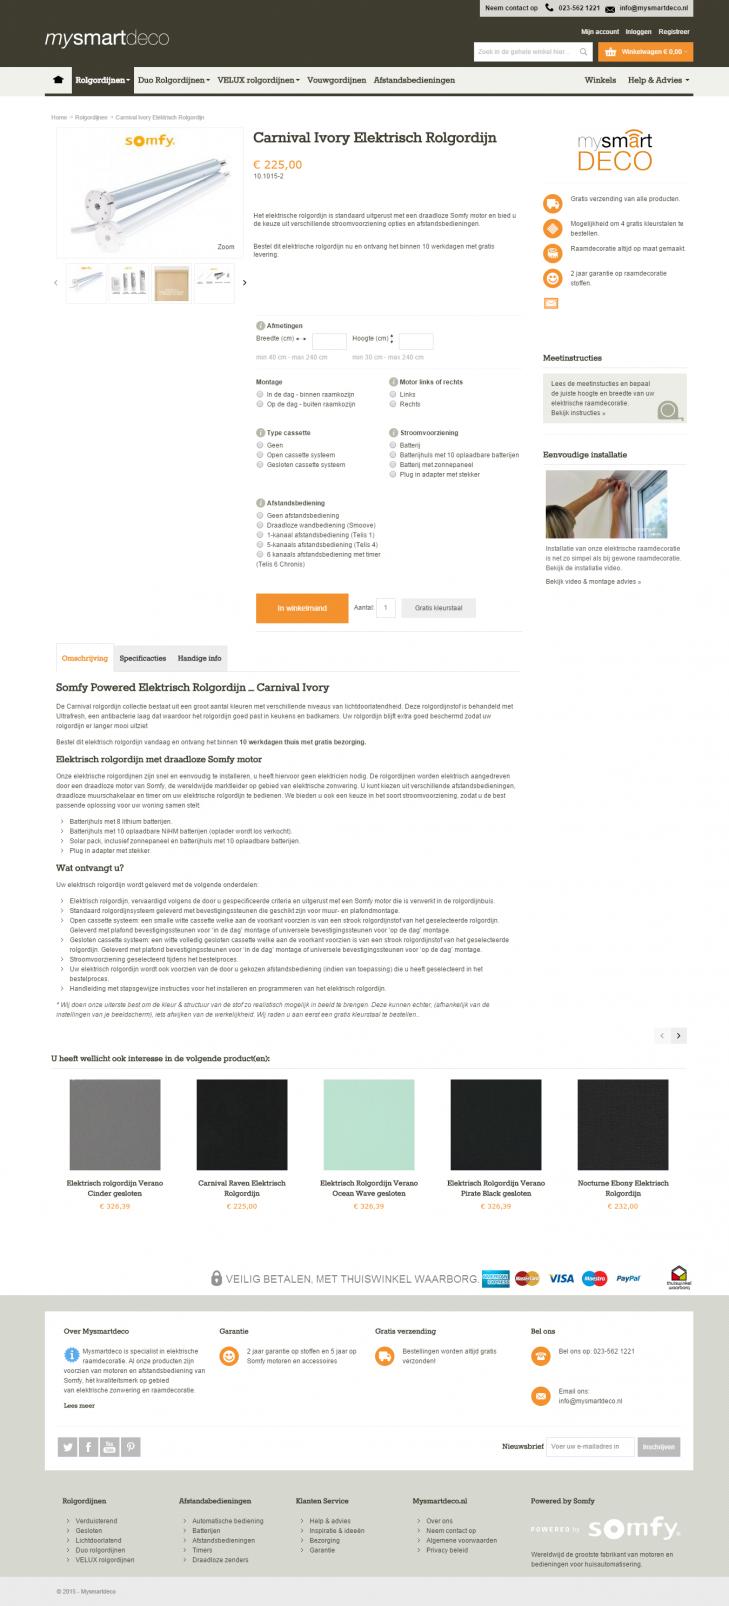 mysmartdeco product page